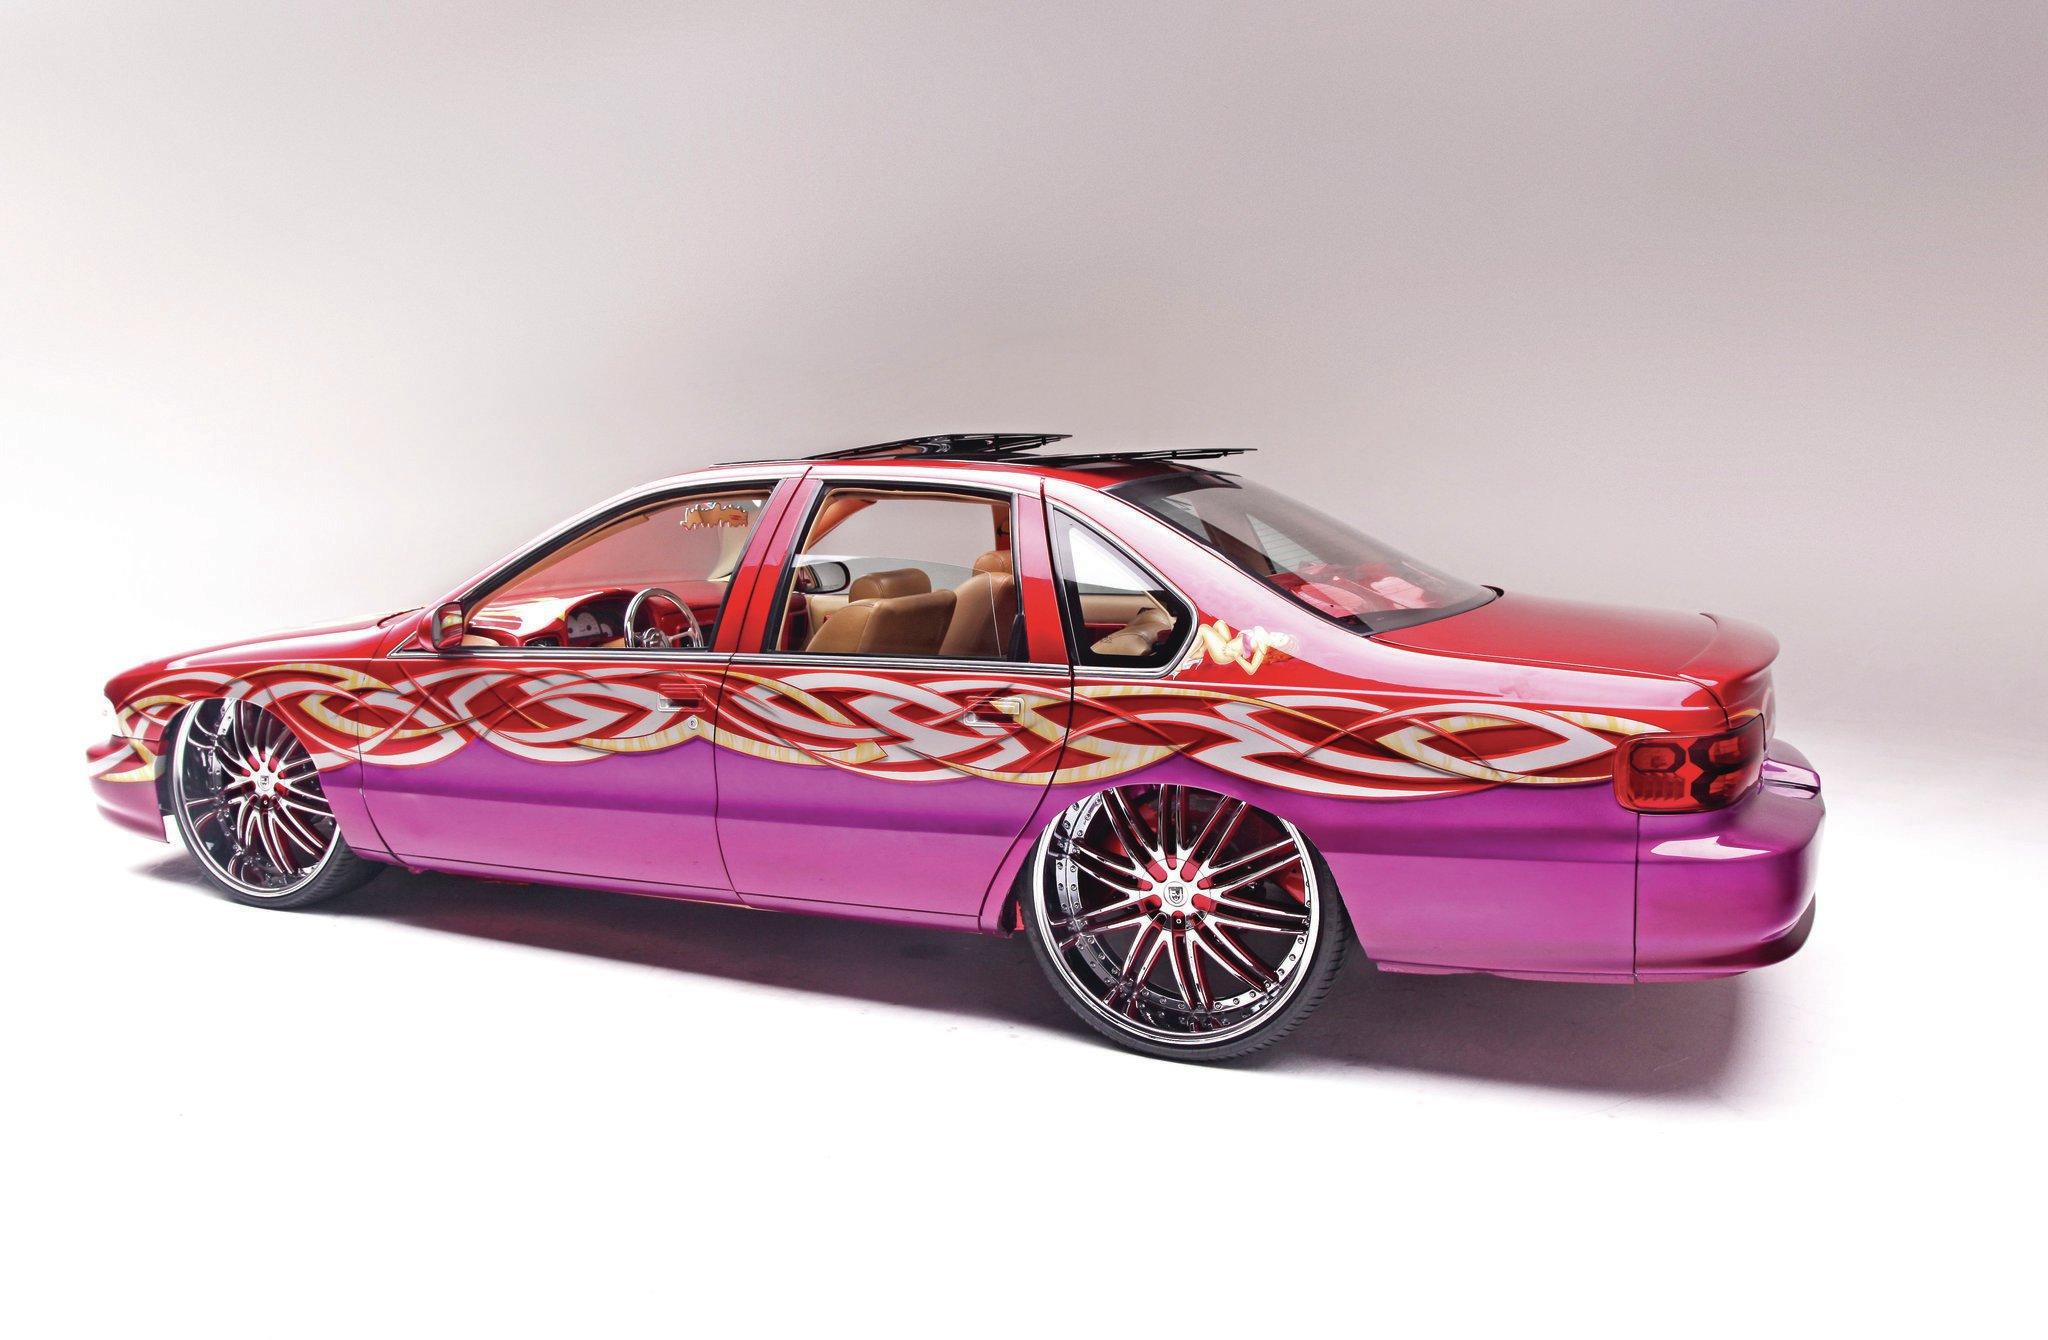 Chevrolet Impala Driver Side View